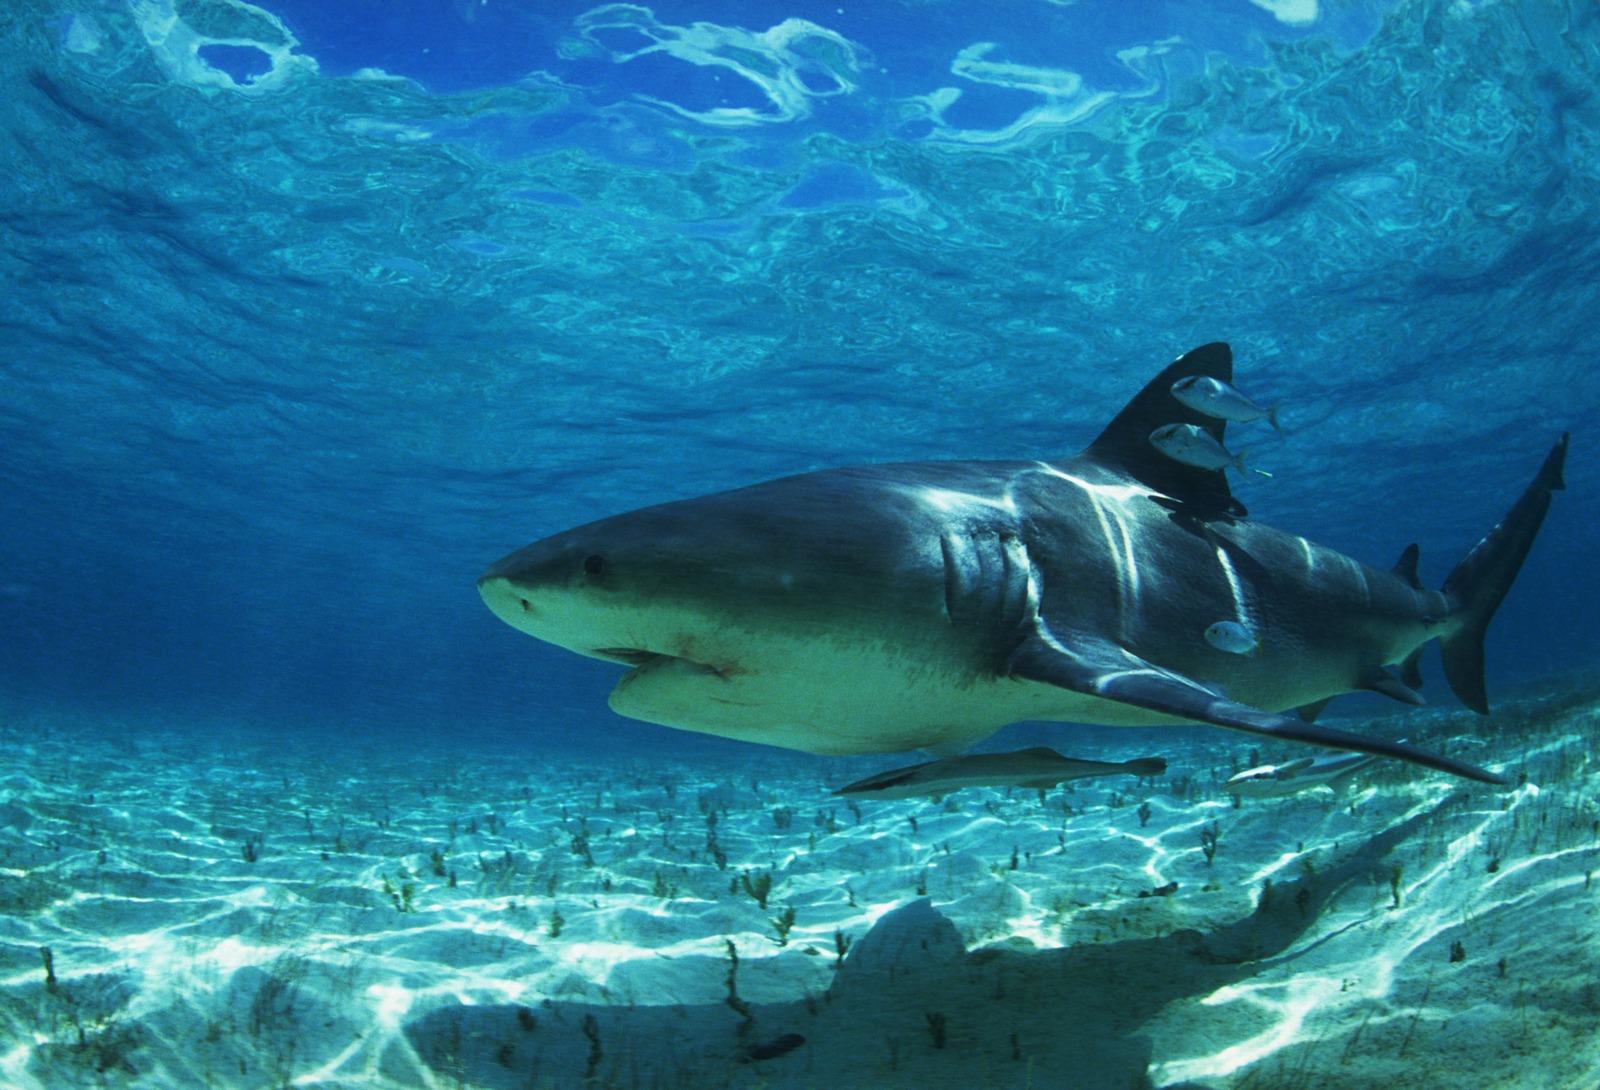 http://1.bp.blogspot.com/-LfUyLNNyKcU/Tkgh6sbhdnI/AAAAAAAALN0/65aYEXSn4BQ/s1600/Sharks%2Band%2BKiller%2BWhales%2BWallpaper%2B%25252827%252529.JPG